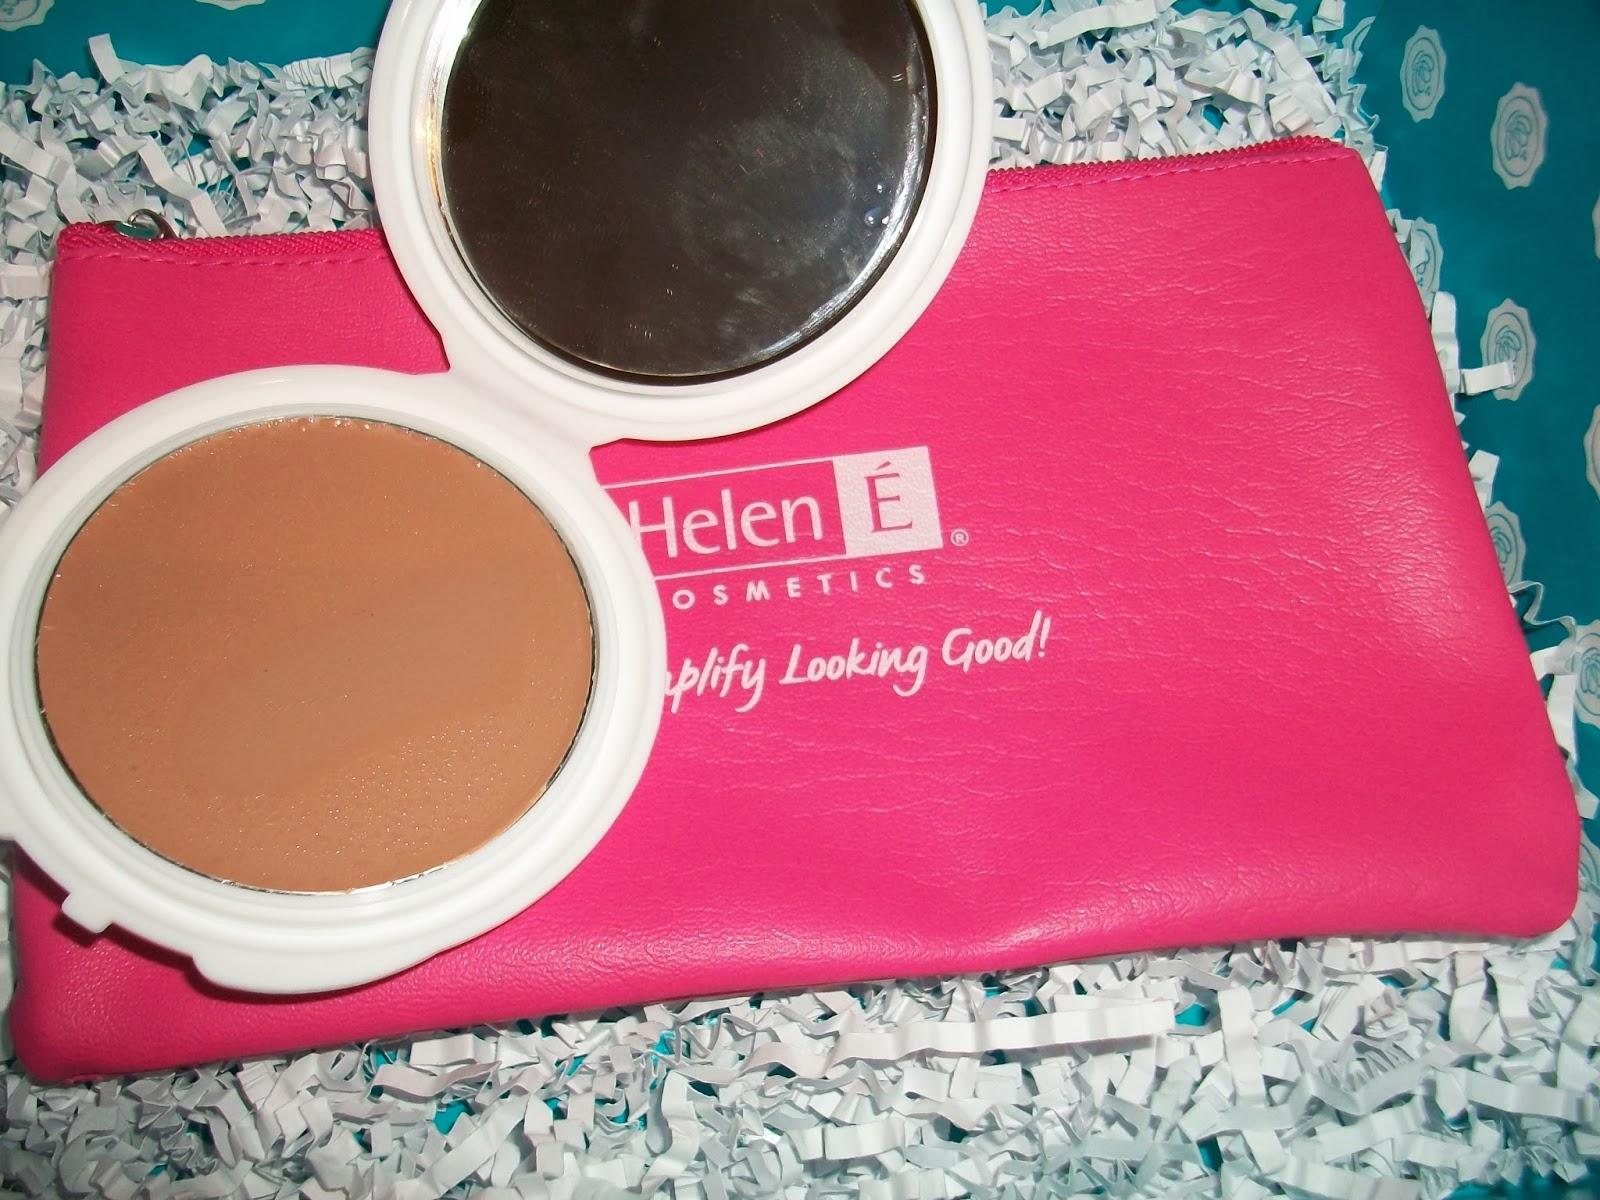 Helen e skin smoother